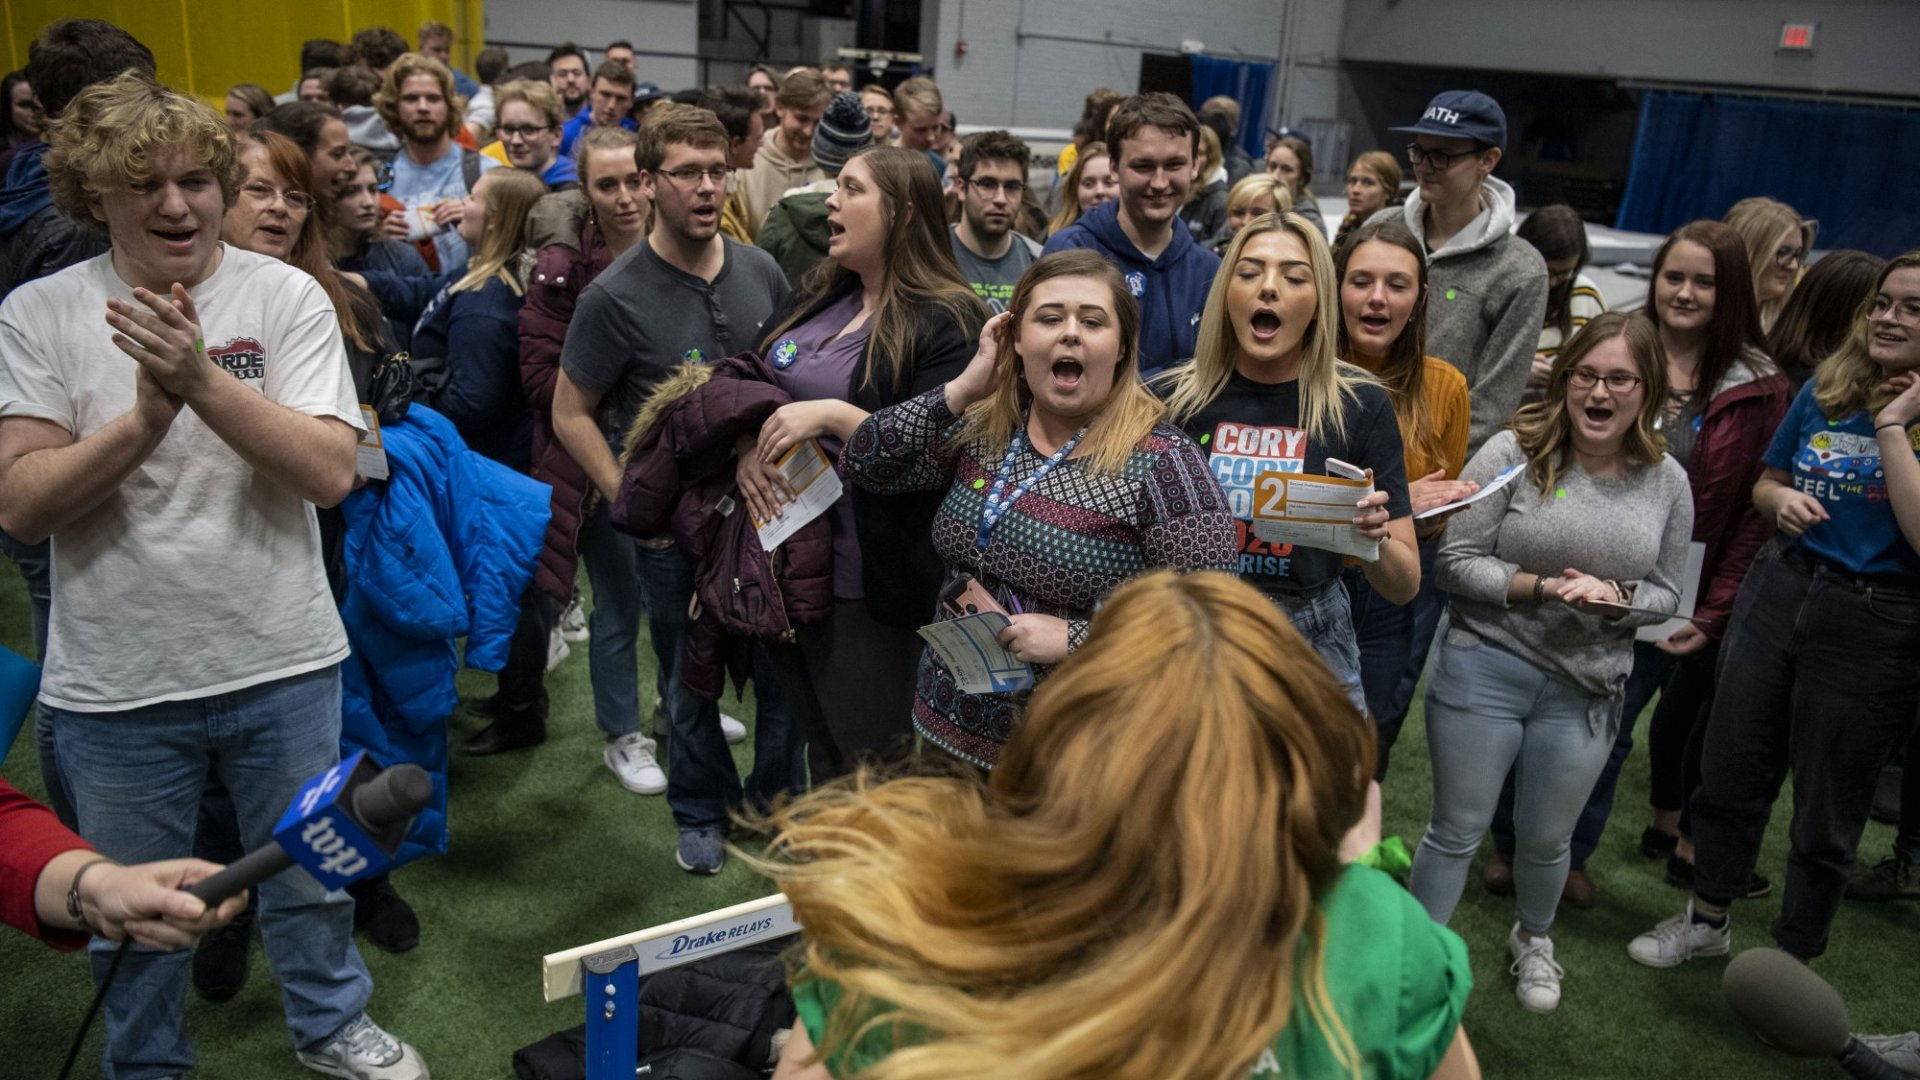 Iowa Caucus Chaos Shows What Happens When Critical Tech Doesn't Work